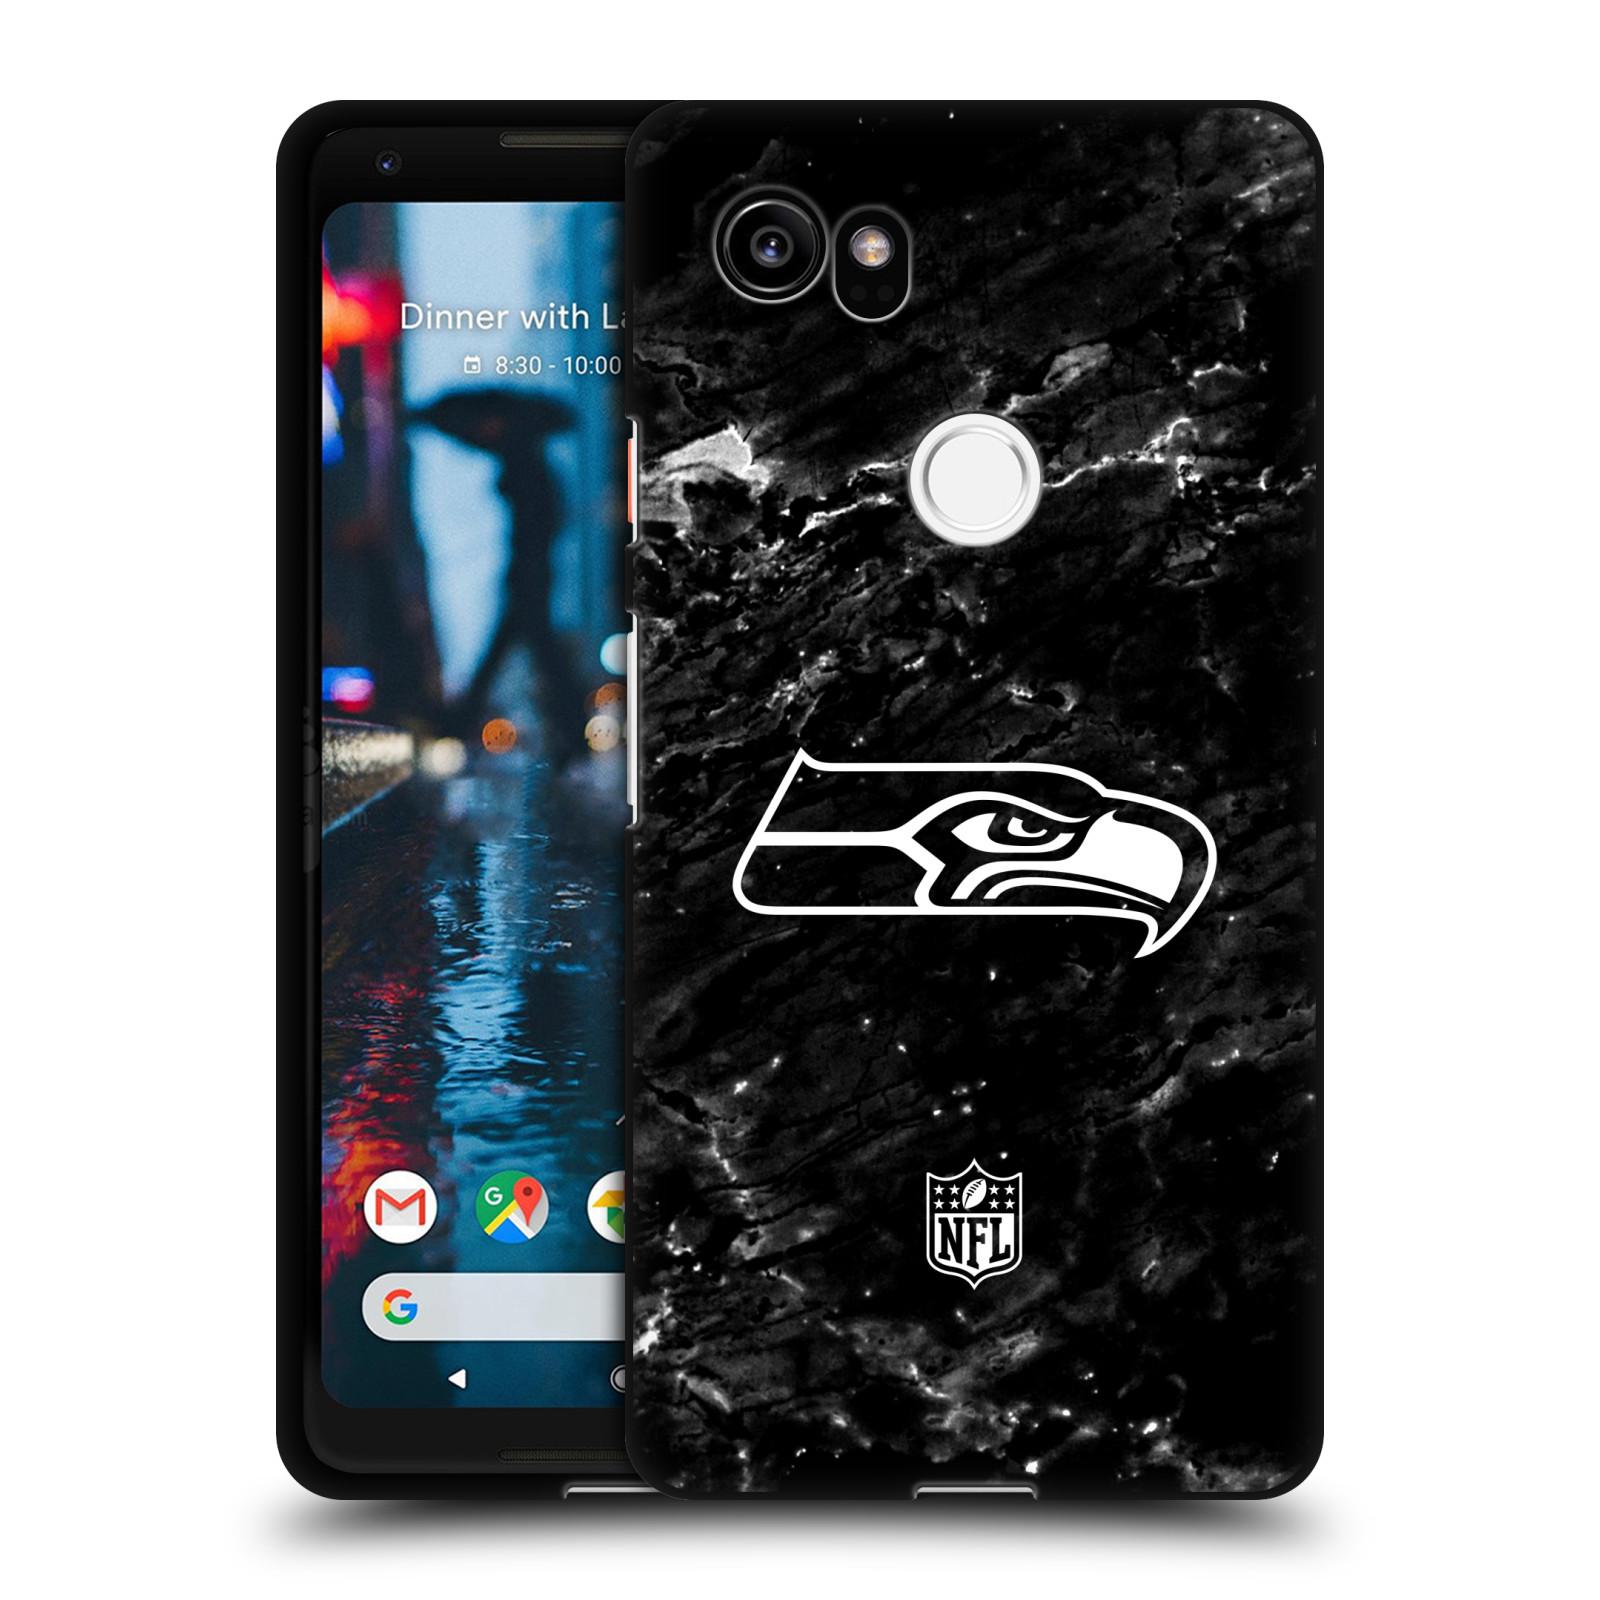 UFFICIALE-NFL-2017-18-SEATTLE-SEAHAWKS-COVER-IN-GEL-NERA-PER-GOOGLE-TELEFONI